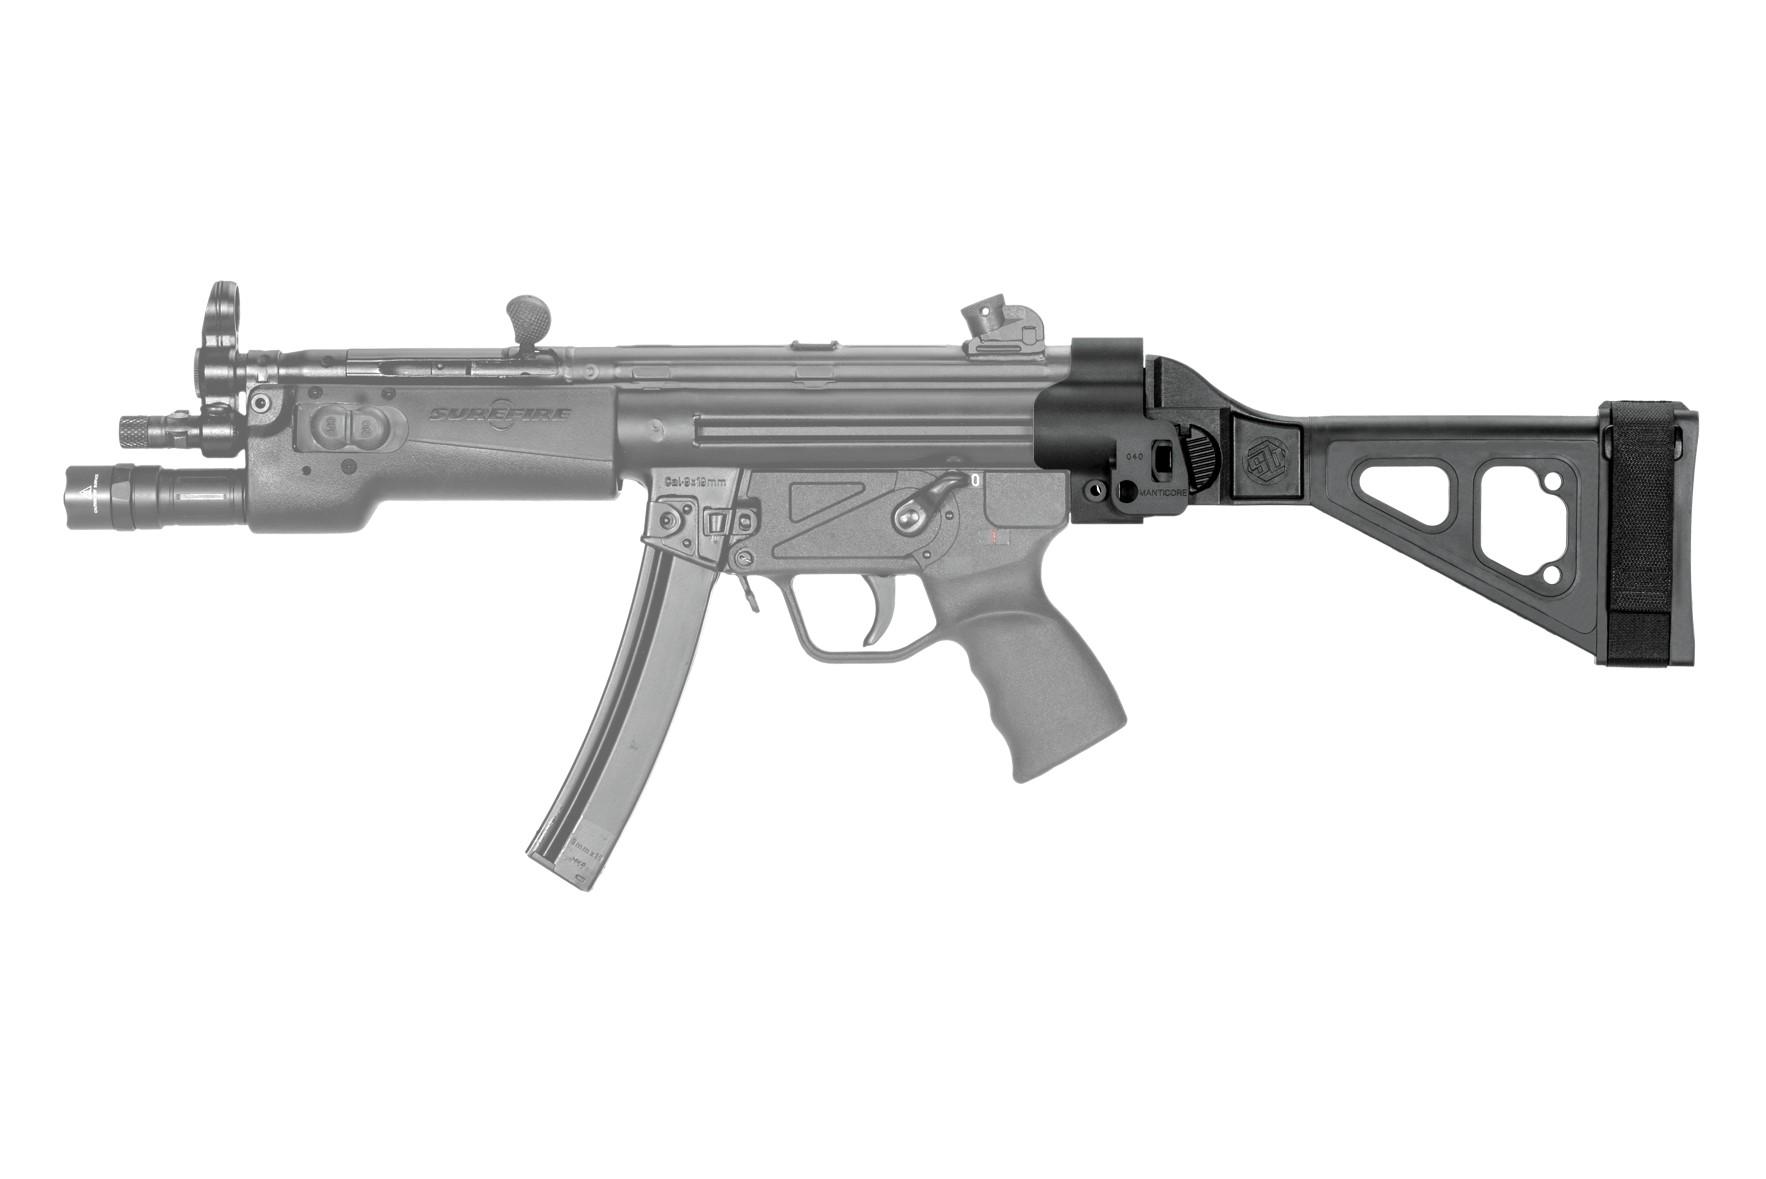 PTR 9CT -PTR 601 /SB brace problem-sbt5a.jpg